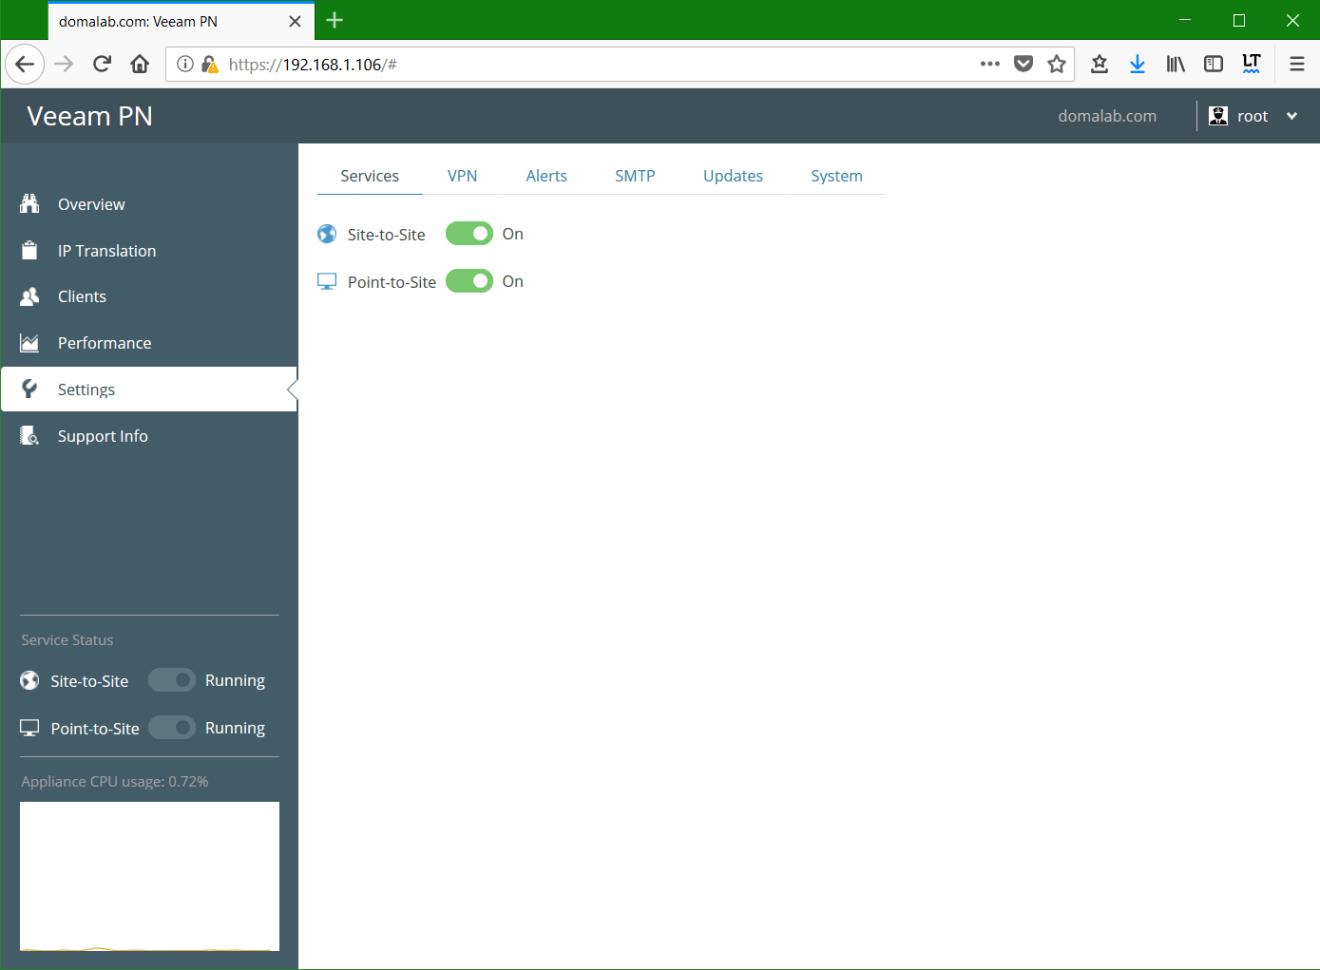 domalab.com Veeam PN services